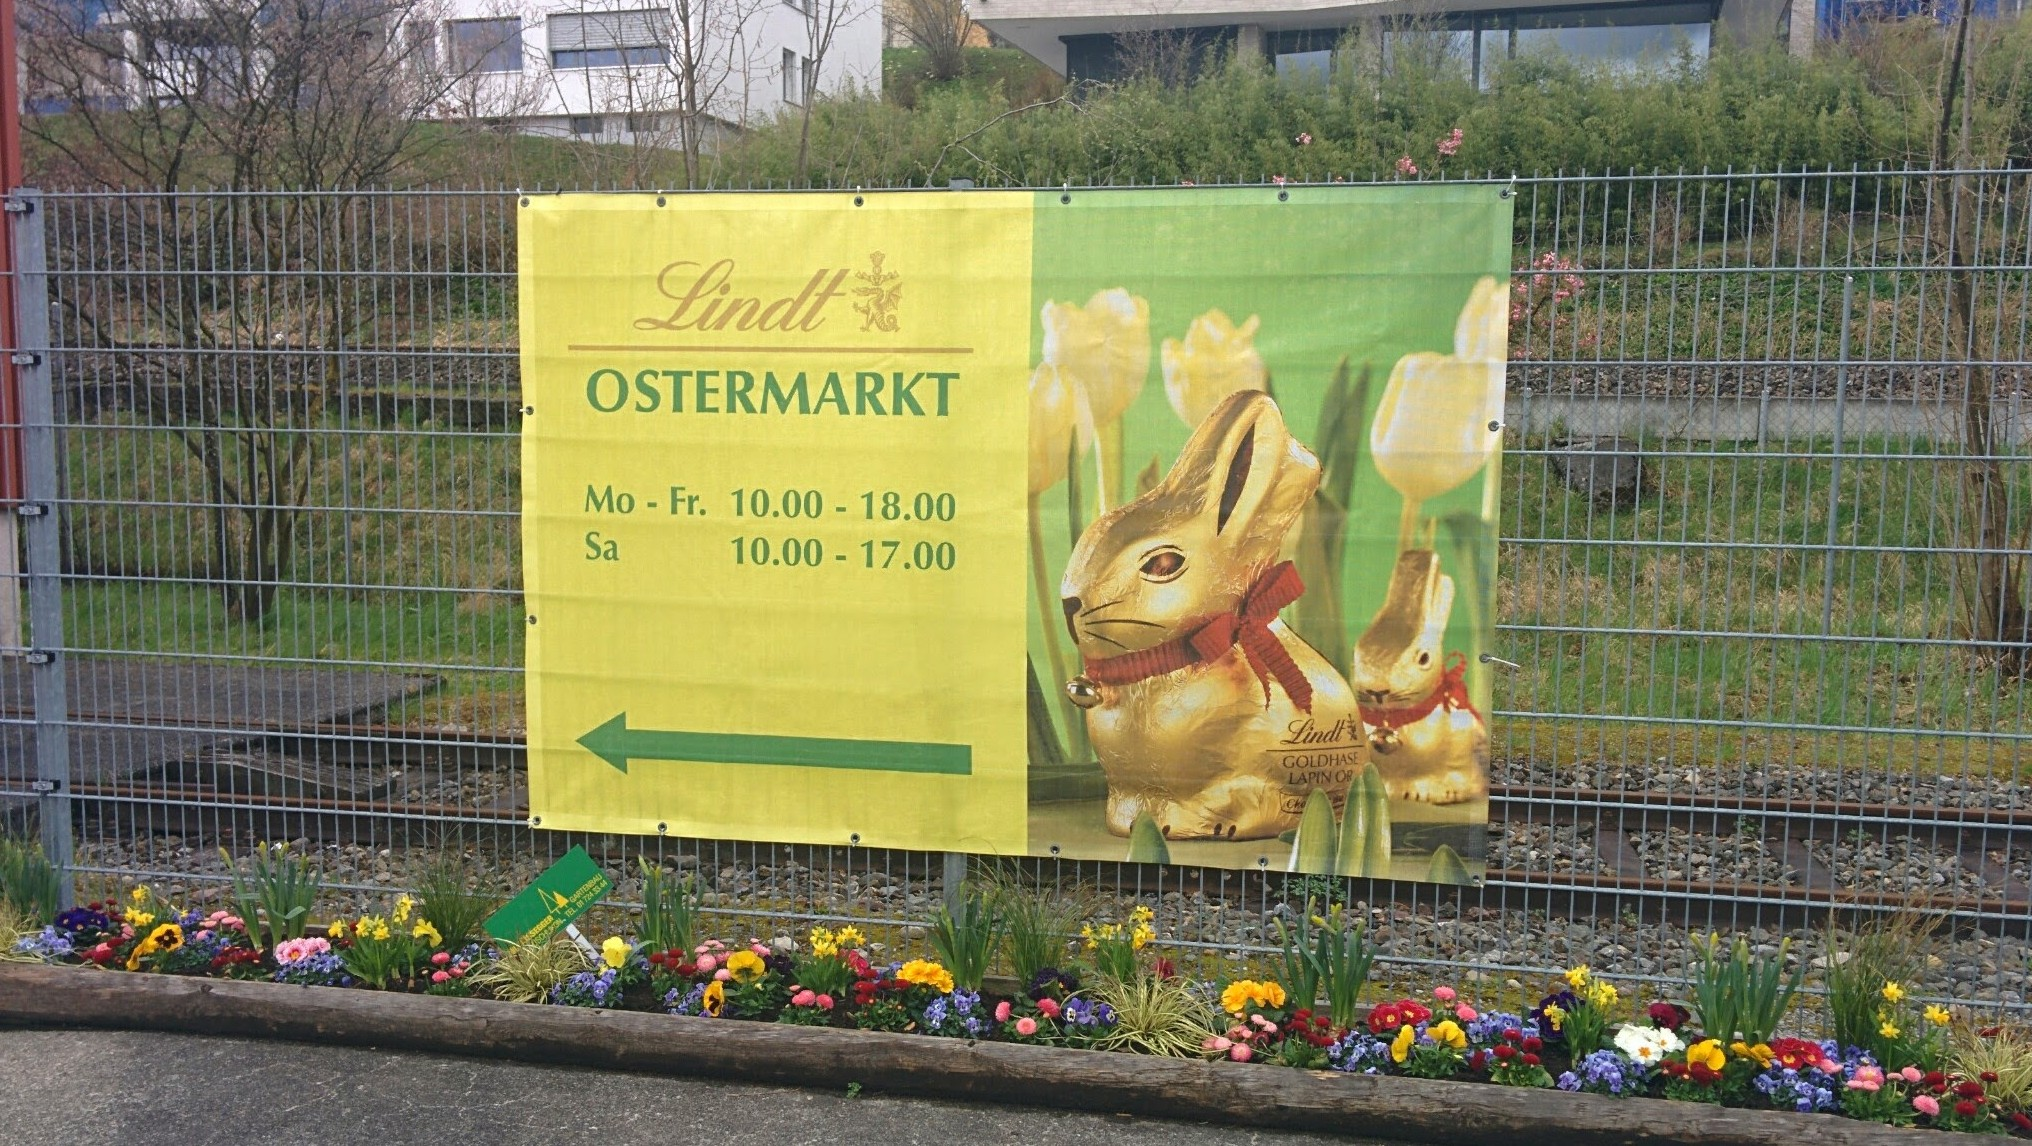 Lindt Ostermarkt